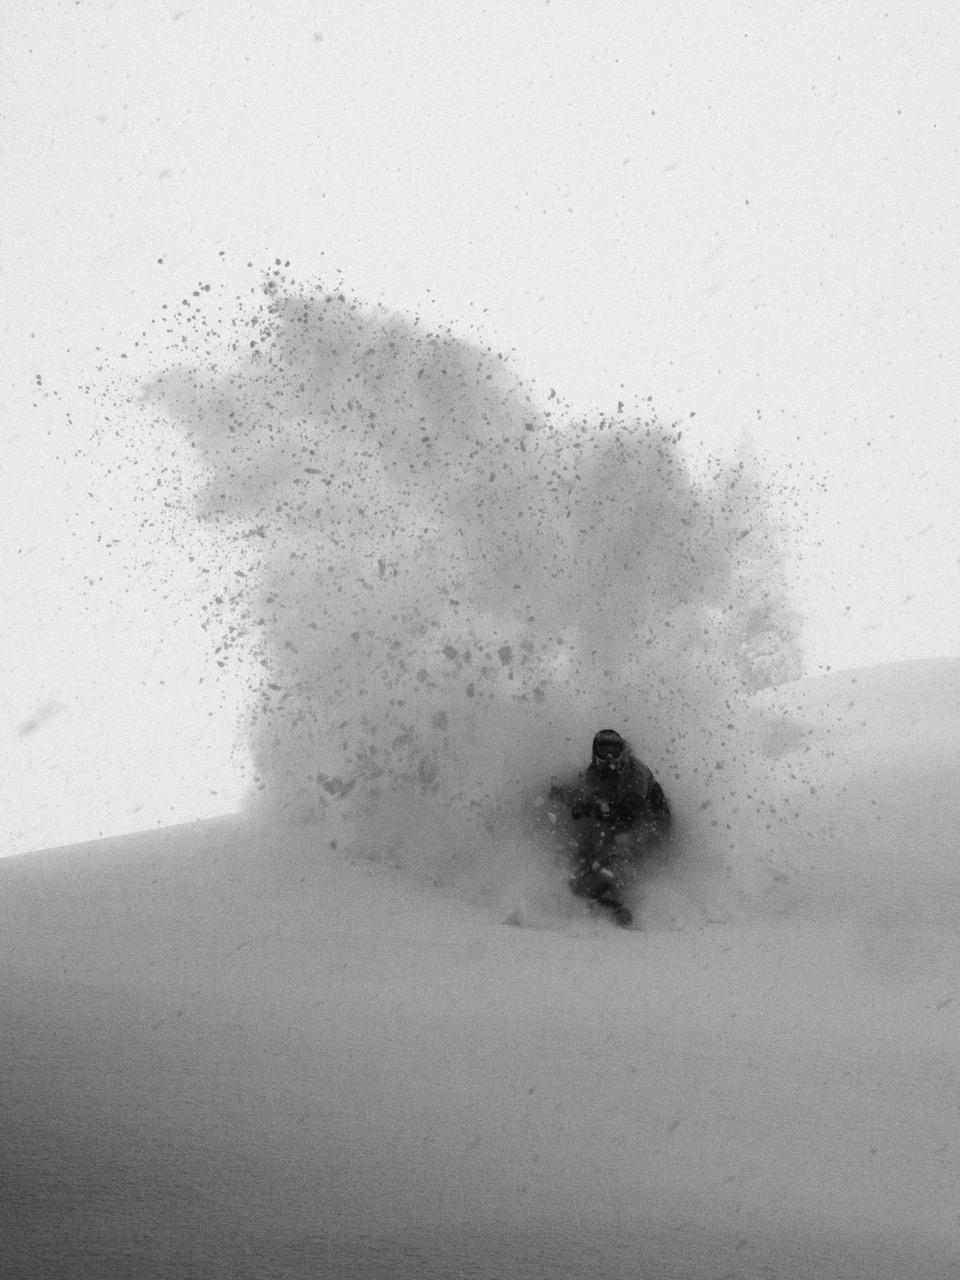 Prime-Snowboarding-Magazine-Mixtape-Sebi-Geiger_Slash_Arlberg_TheoAcworth